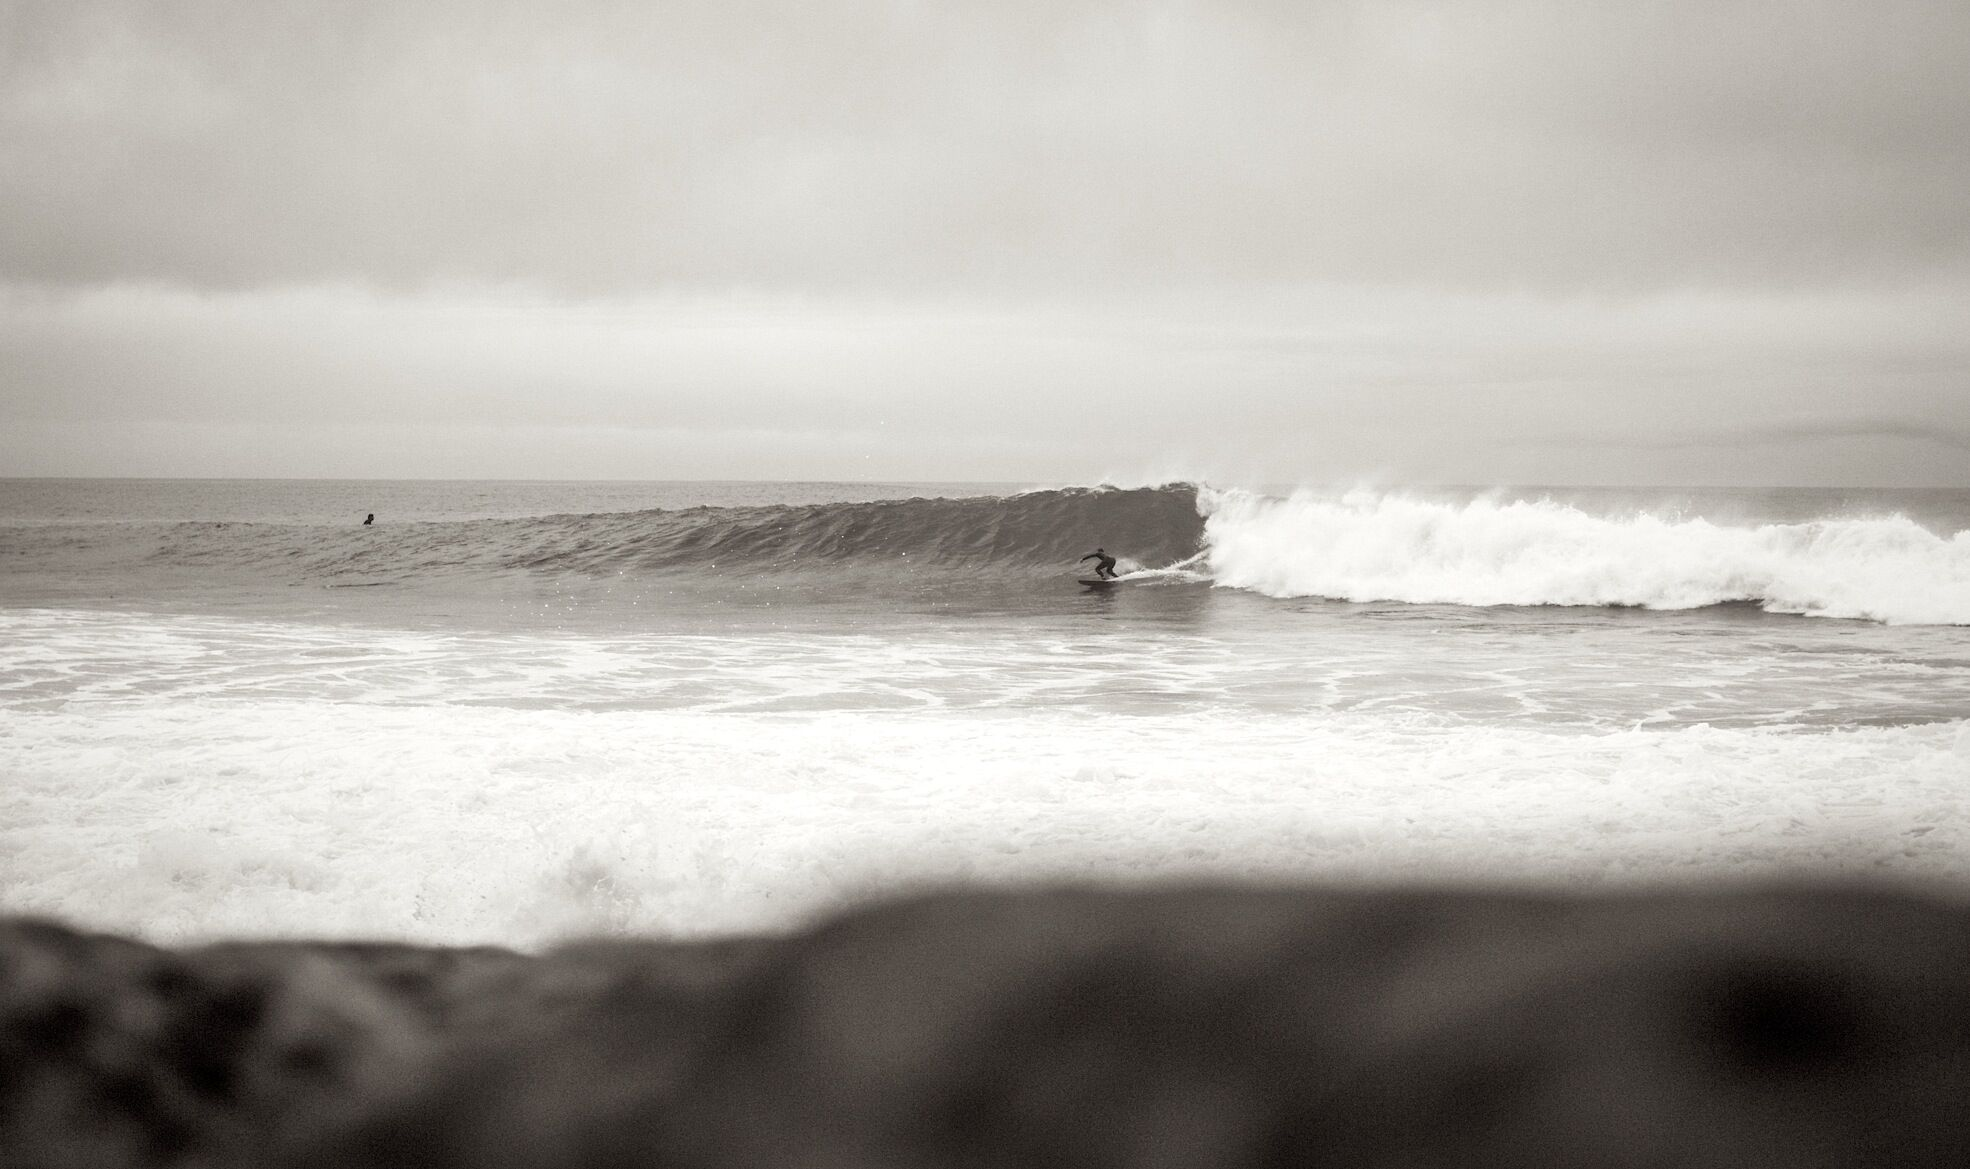 surf spots in Morocco